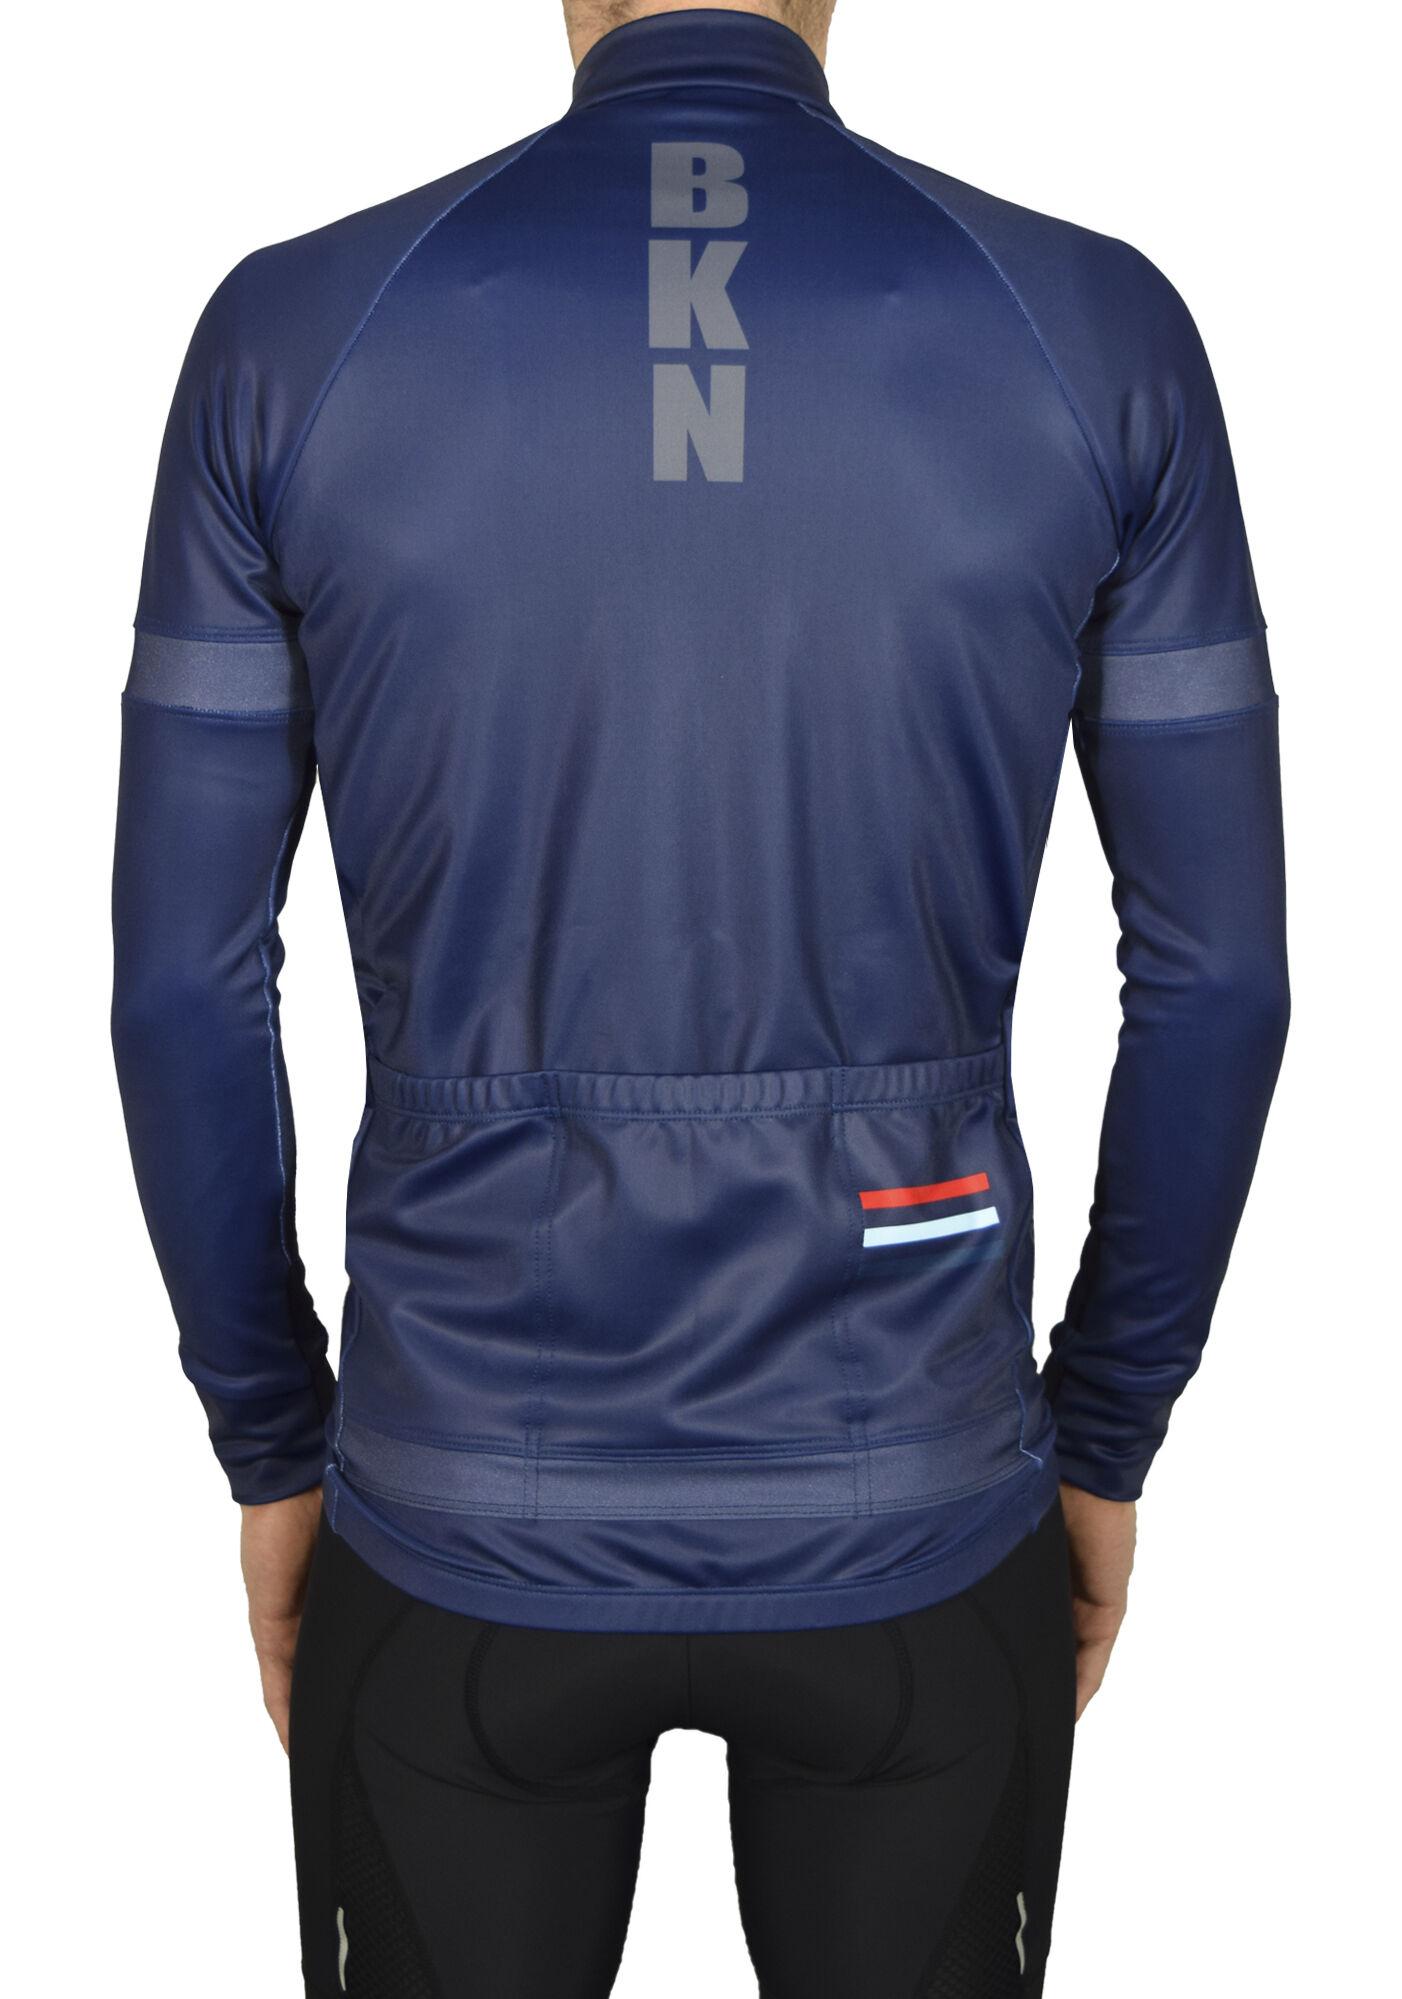 BKN Navy Reflective Jacket BACK